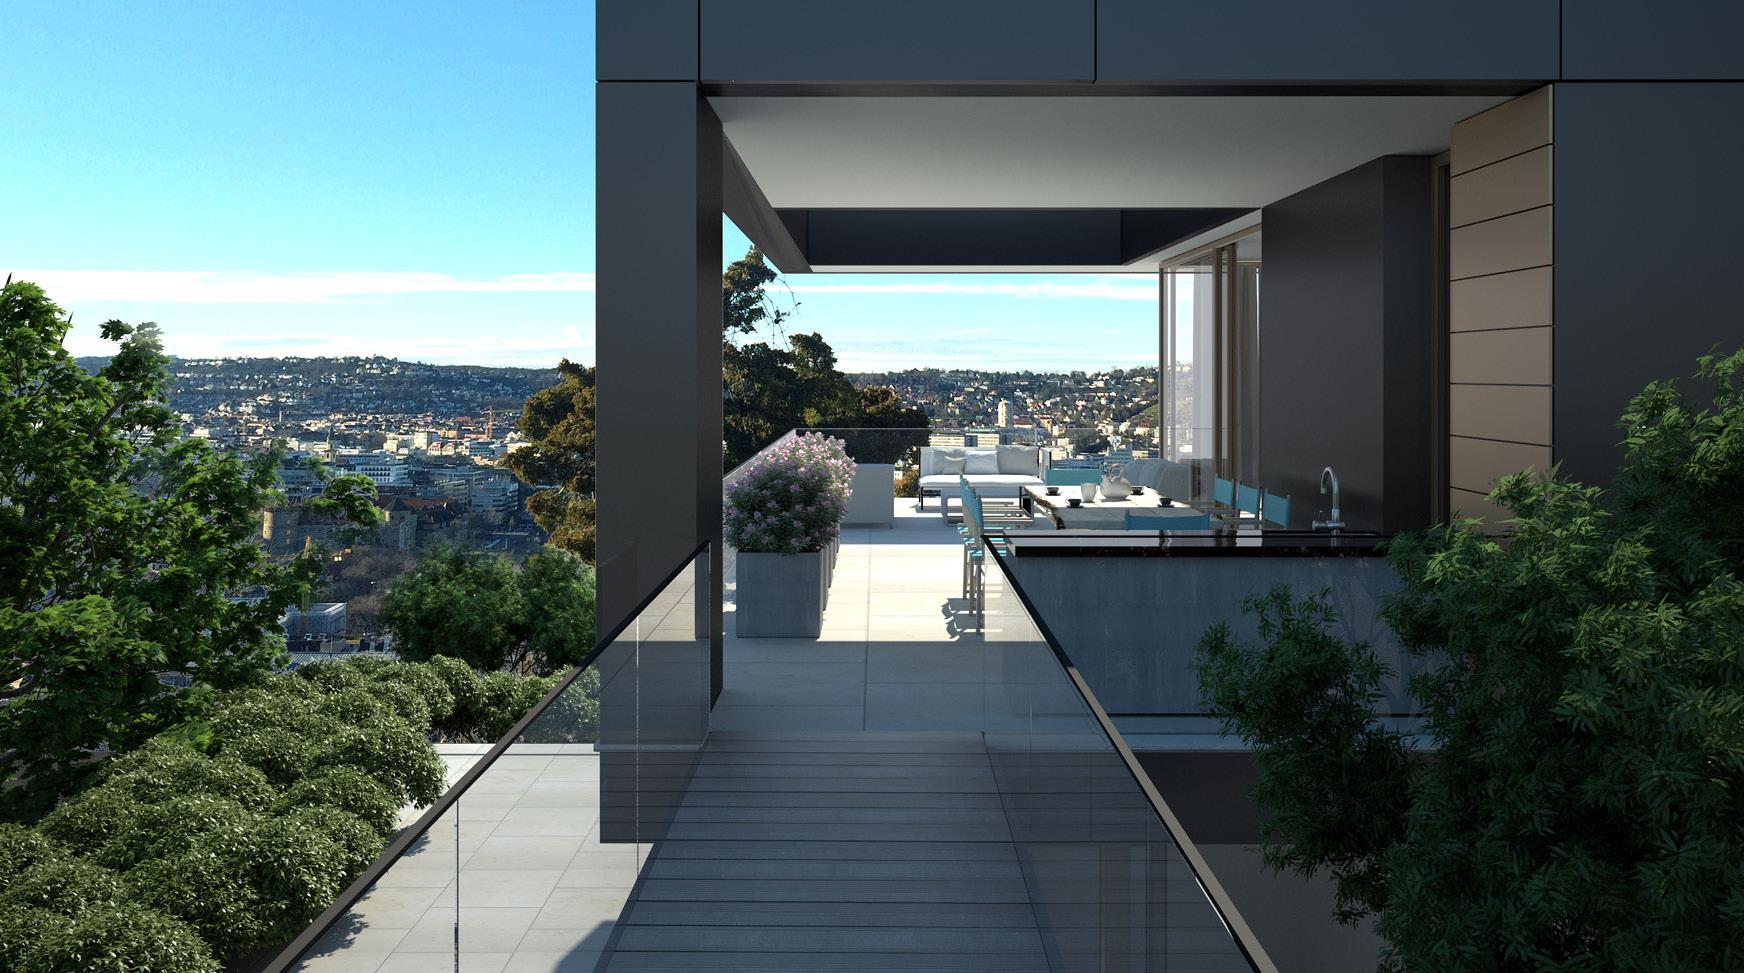 projekt haus am hang stuttgart architekten bda fuchs. Black Bedroom Furniture Sets. Home Design Ideas